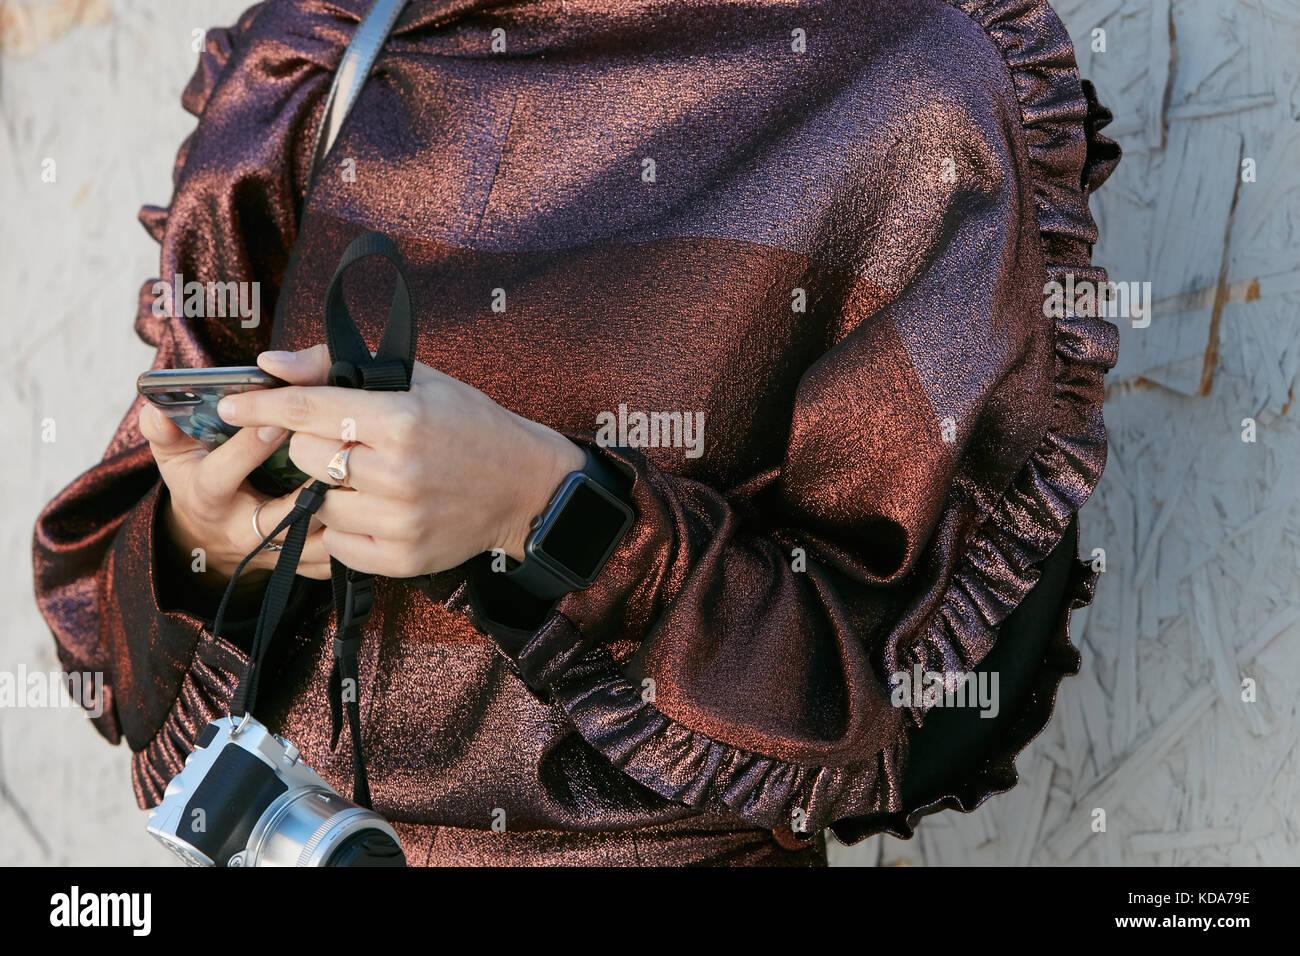 Milan - 20 septembre: femme avec robe métallique bronze, montres et appareils apple looking at smartphone Photo Stock